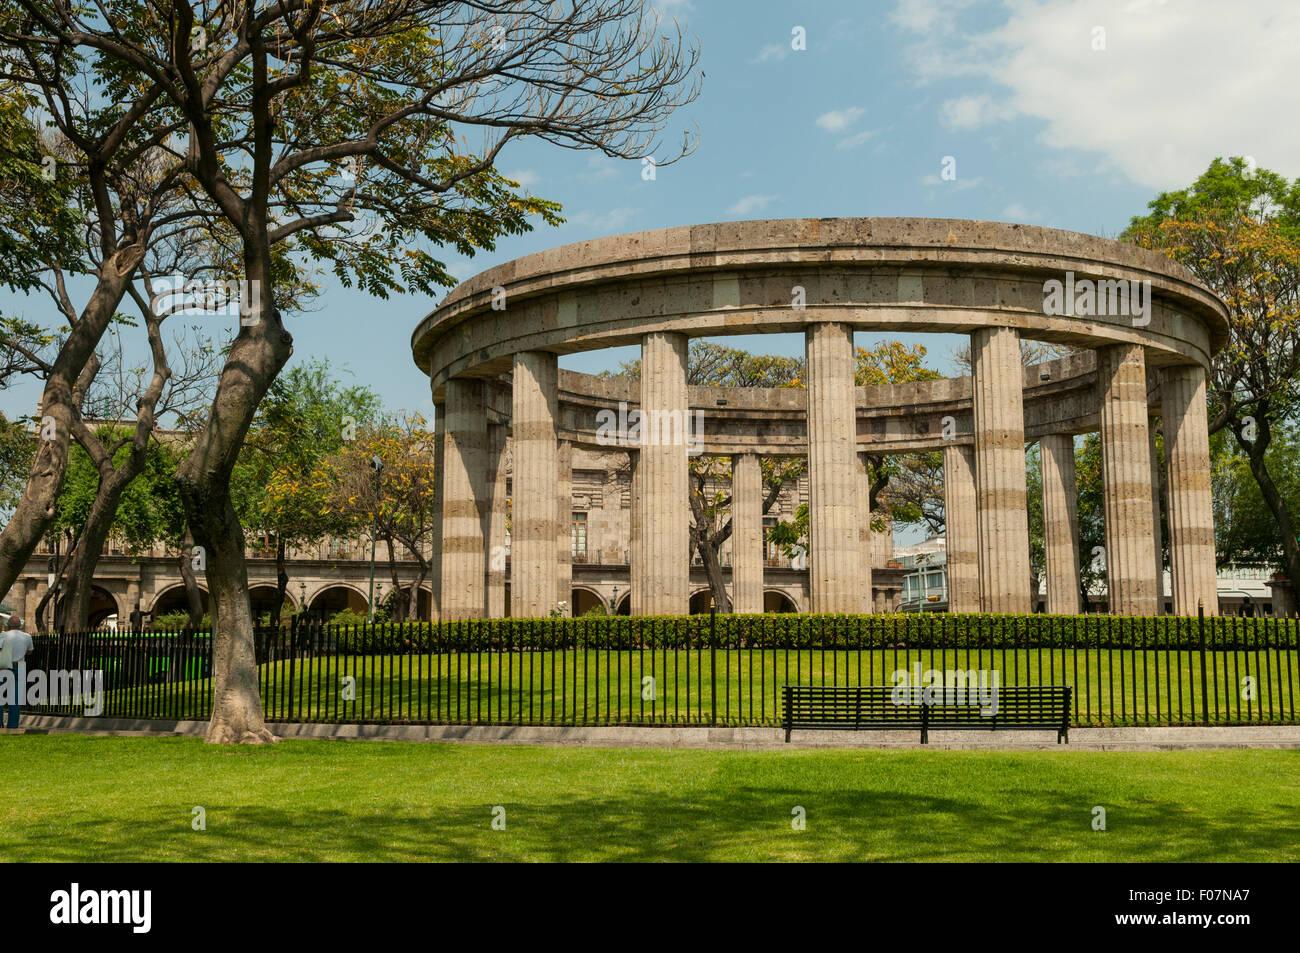 Rotonda de los Hombres Illustres, Guadalajara, Mexico Stock Photo